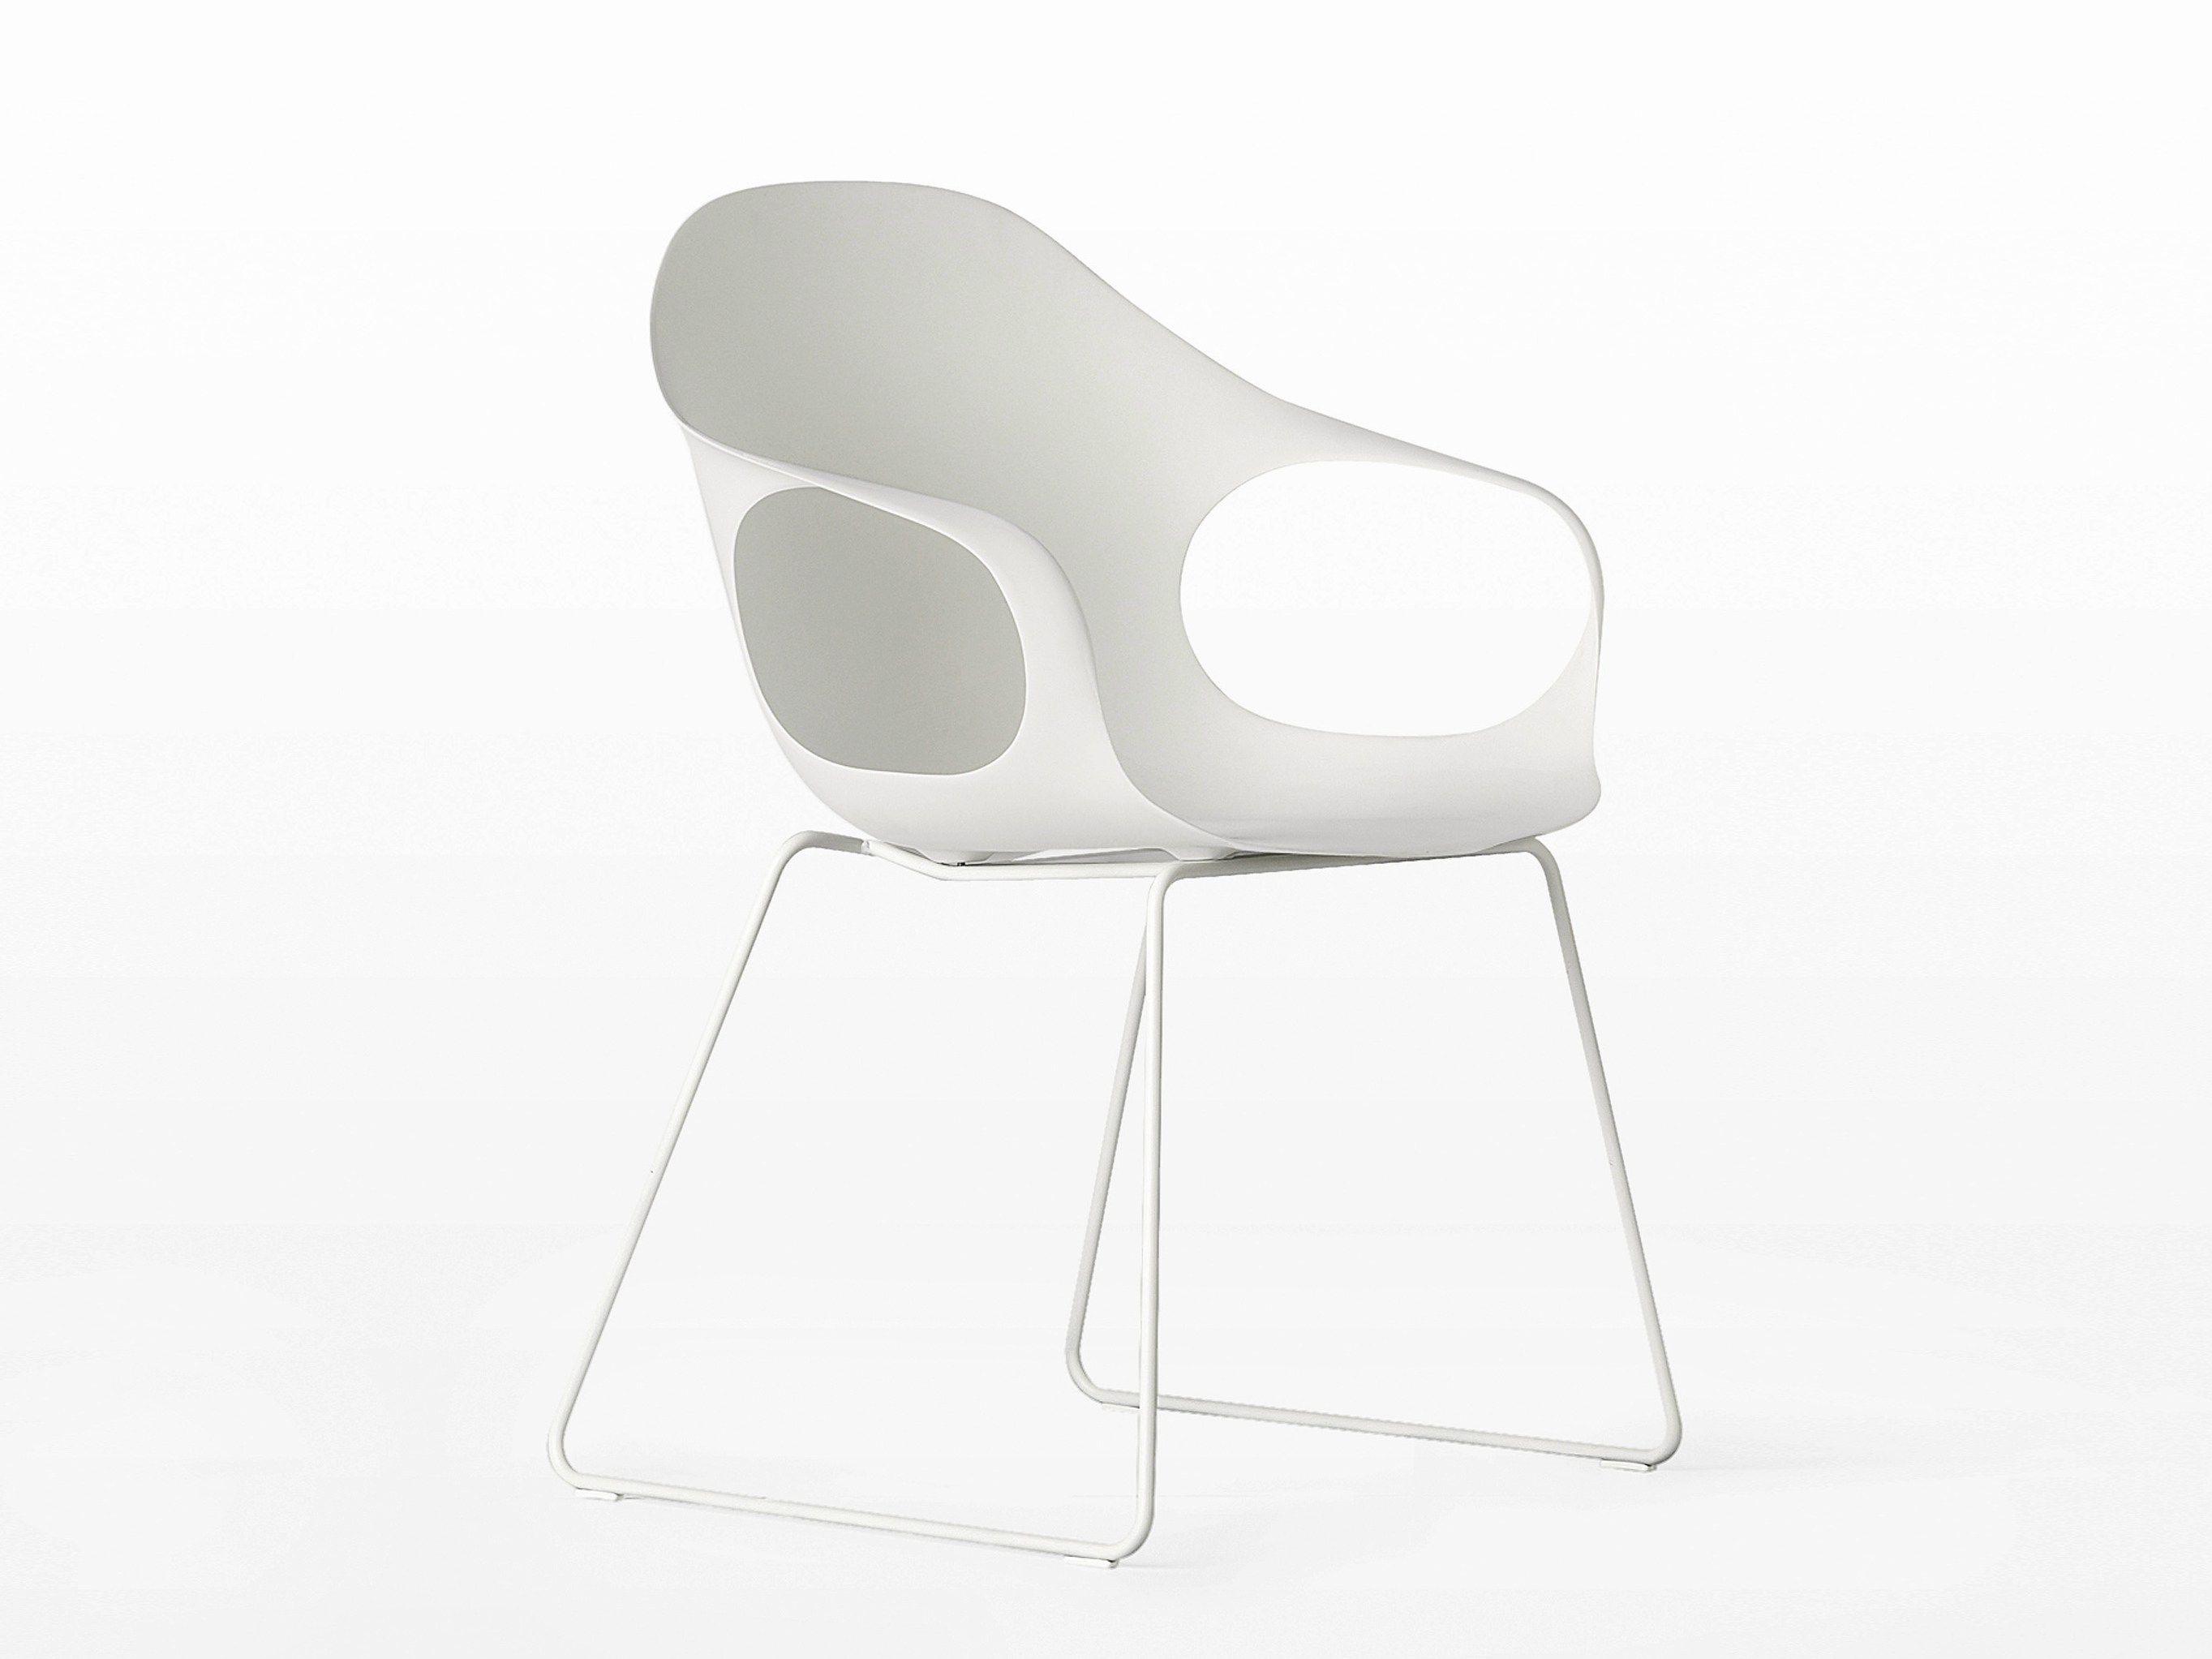 elephant stuhl mit kufengestell by kristalia design eva paster michael geldmacher. Black Bedroom Furniture Sets. Home Design Ideas